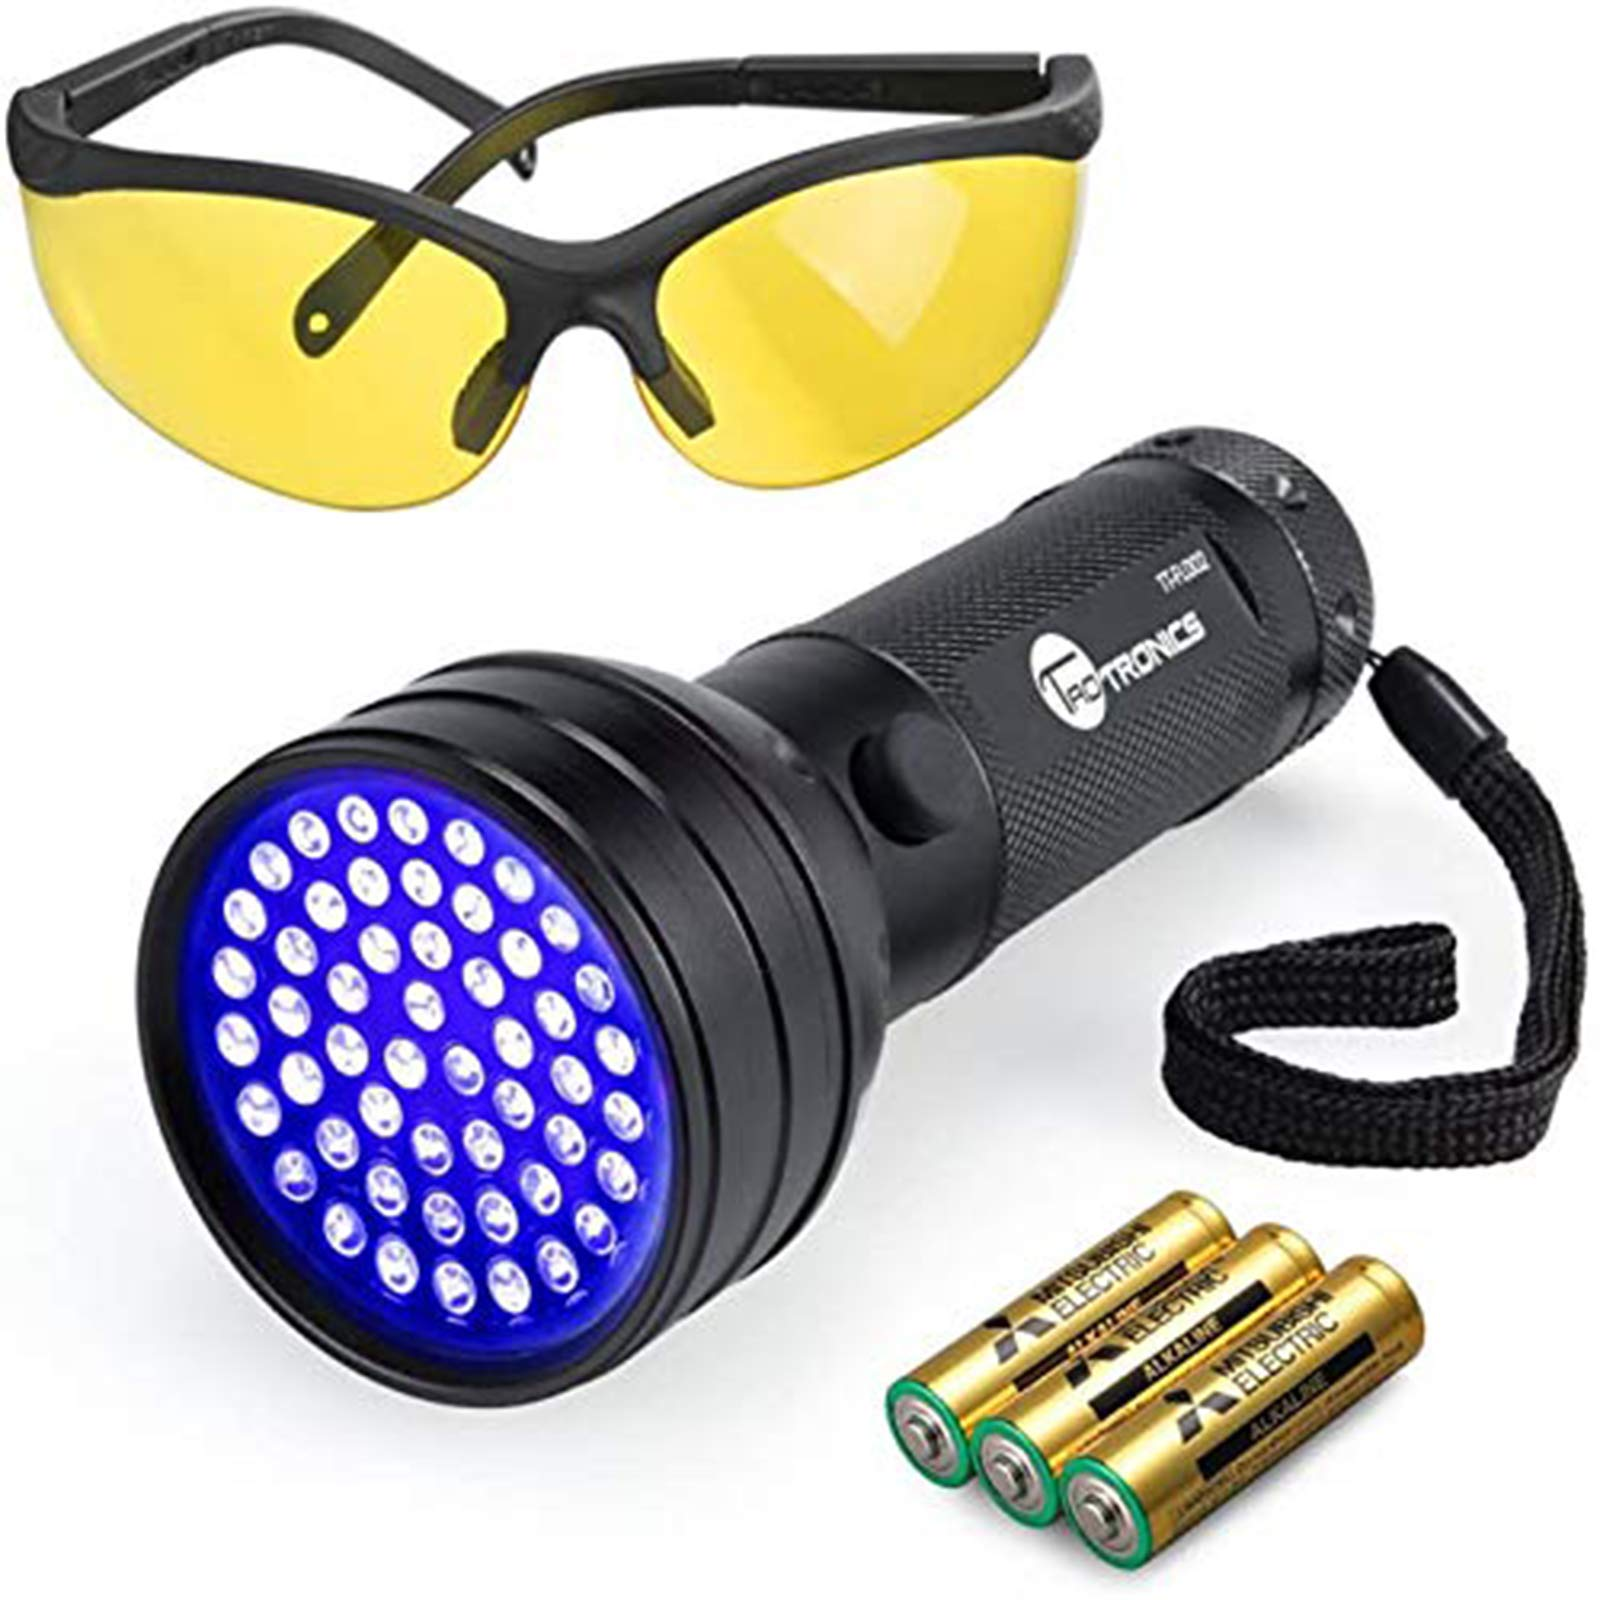 TaoTronics TT-FL002 Black Light, 51 LEDs Uv Blacklight Flashlights Detector for Dry Pets Urine & Stains & Bed Bug with…